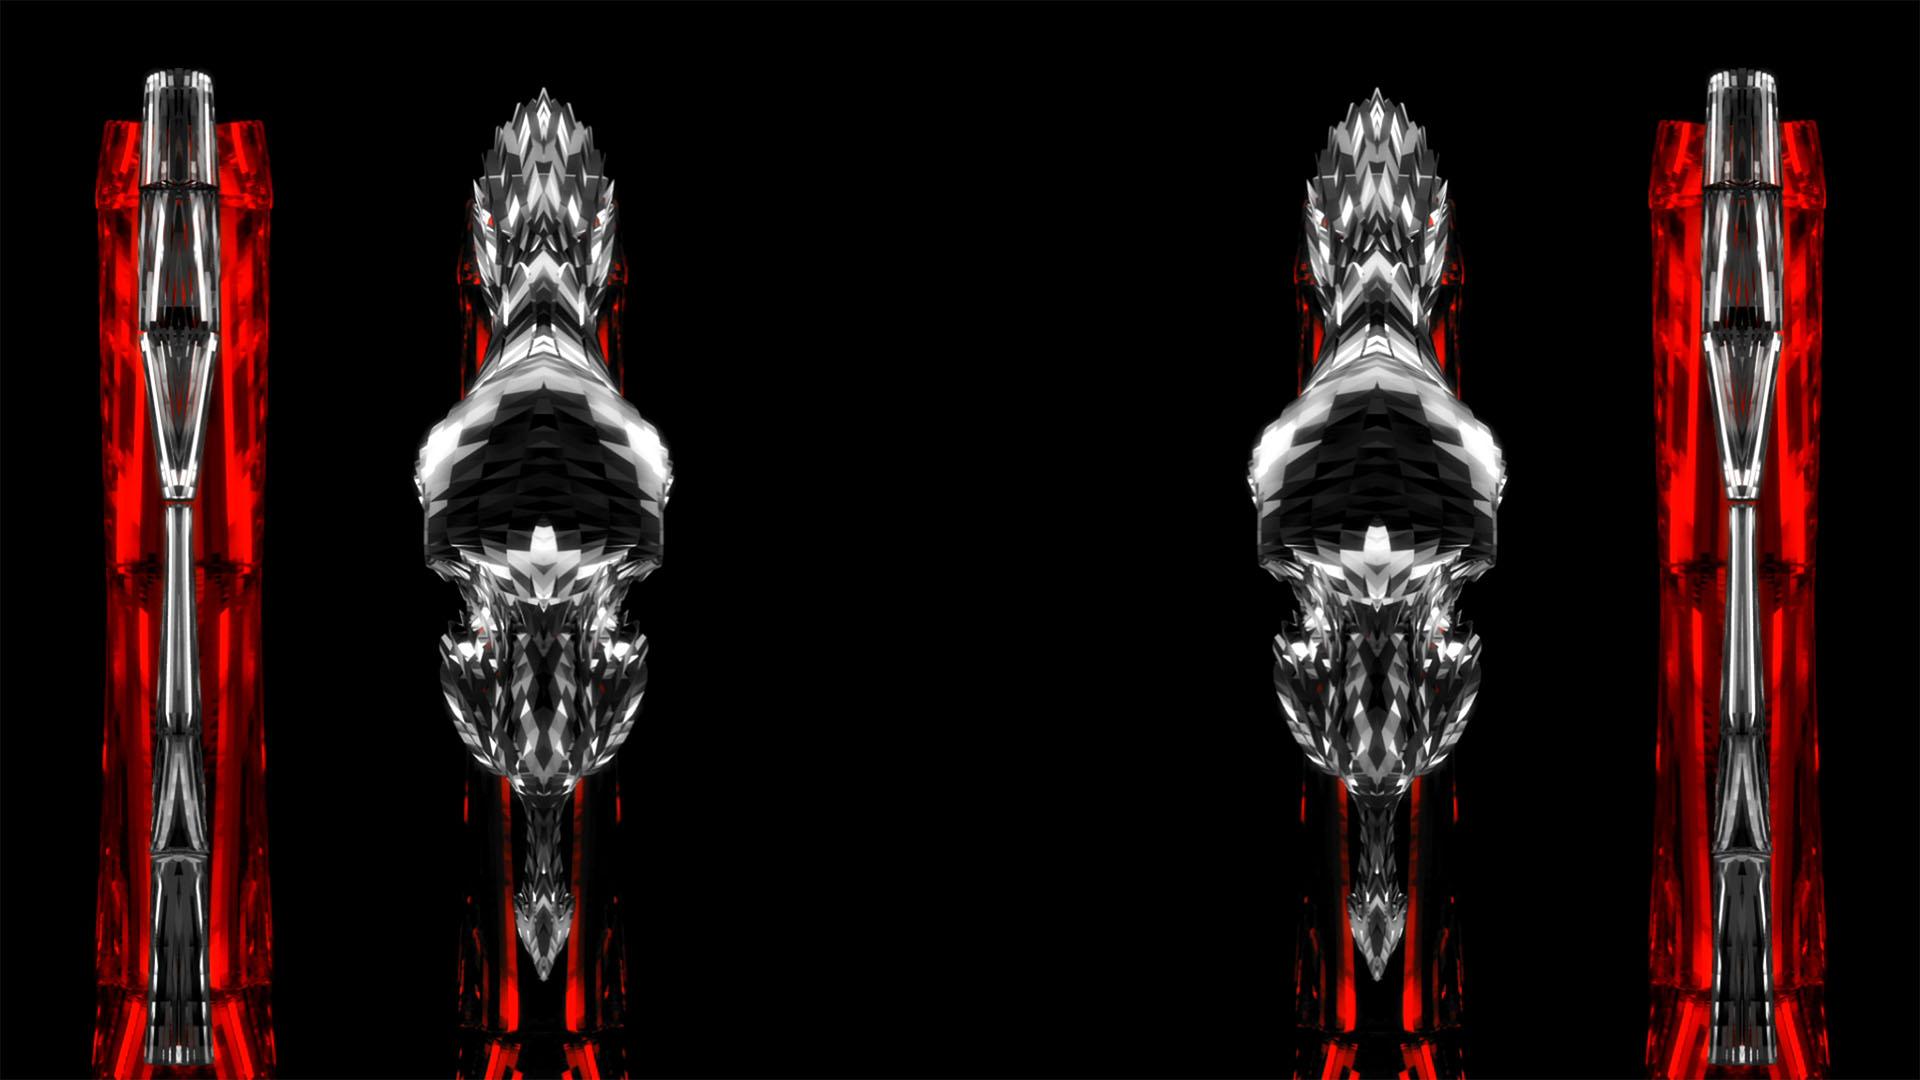 vj loops column visuals video animation